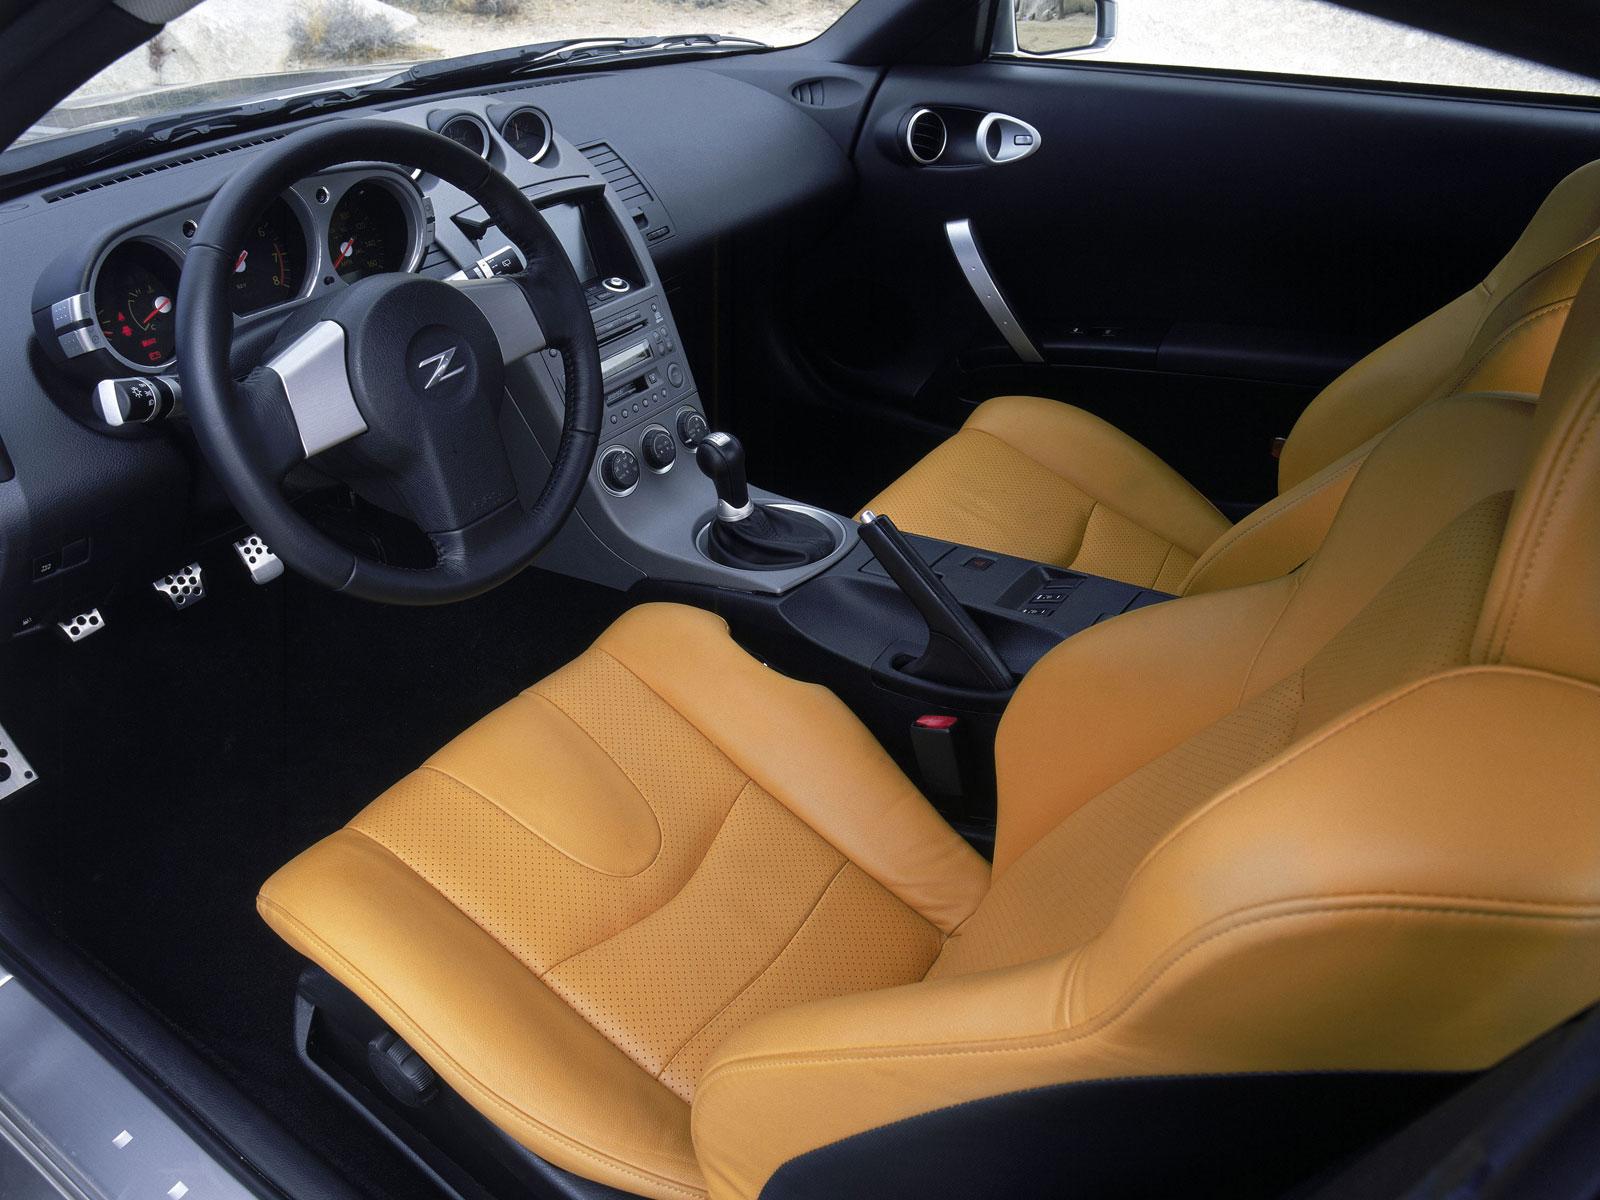 2004 nissan 350z interior. nissan 350z 2002 2005 2004 nissan 350z interior